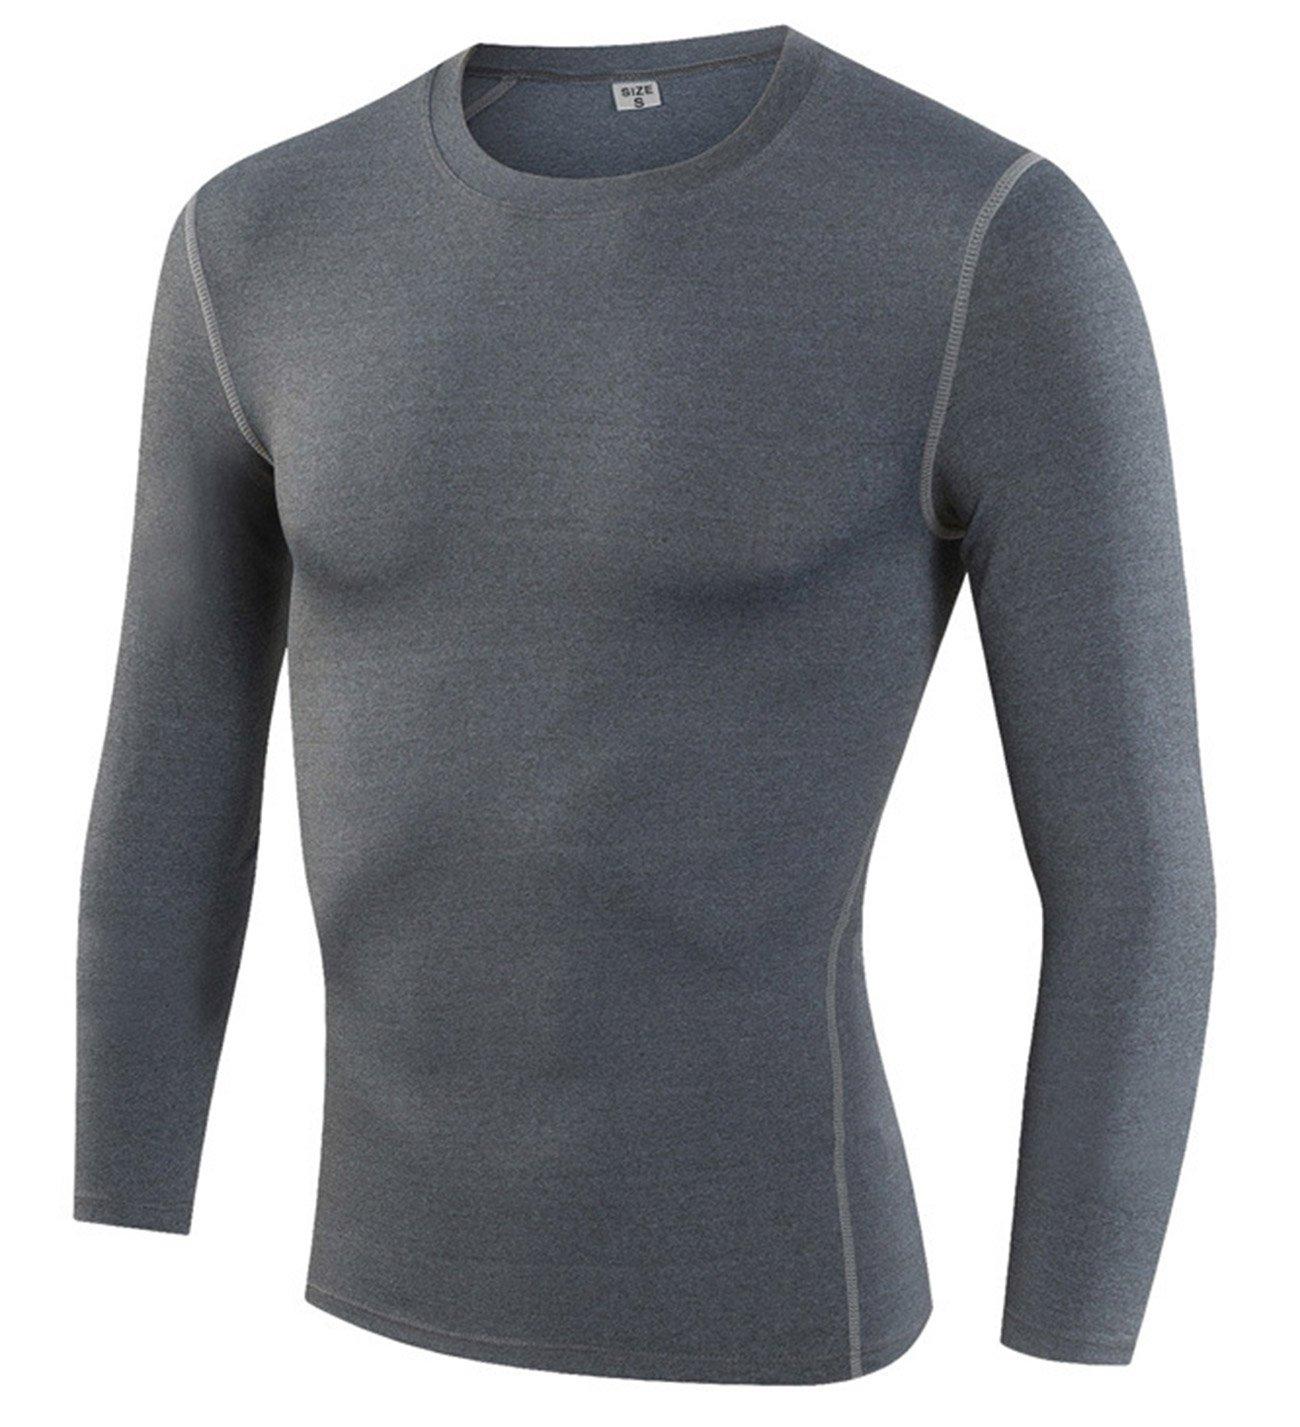 yuerlianメンズ圧縮シャツ長袖Thermal Baselayer coldgeat Running Shirts B074X4W4MC グレー Tag size M/US XS